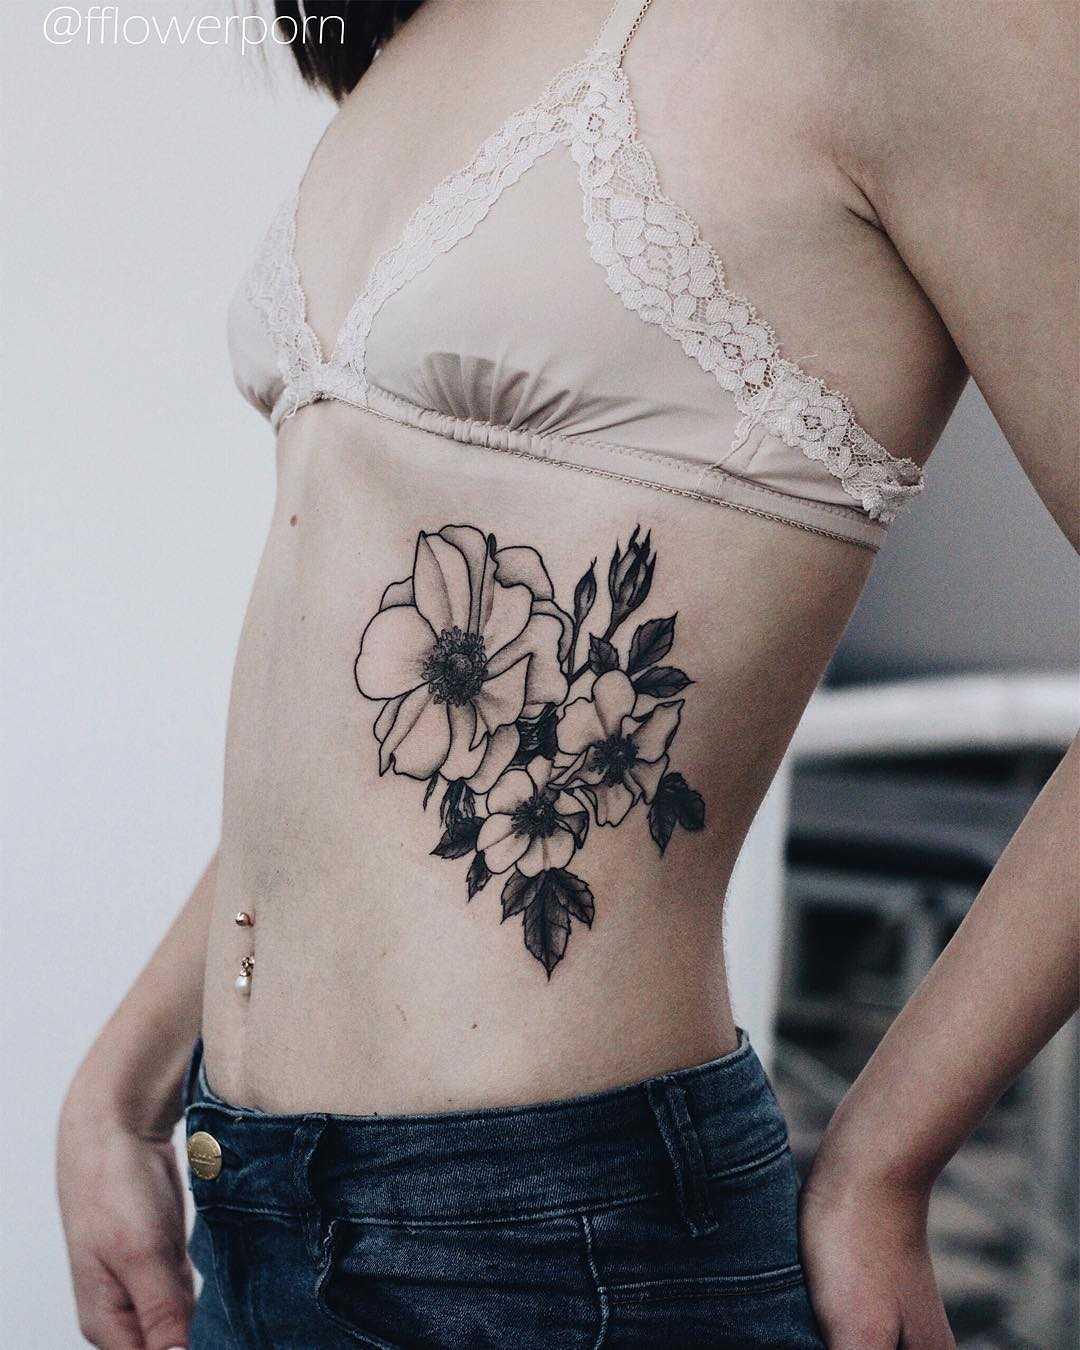 Anemone and wild roses tattoo